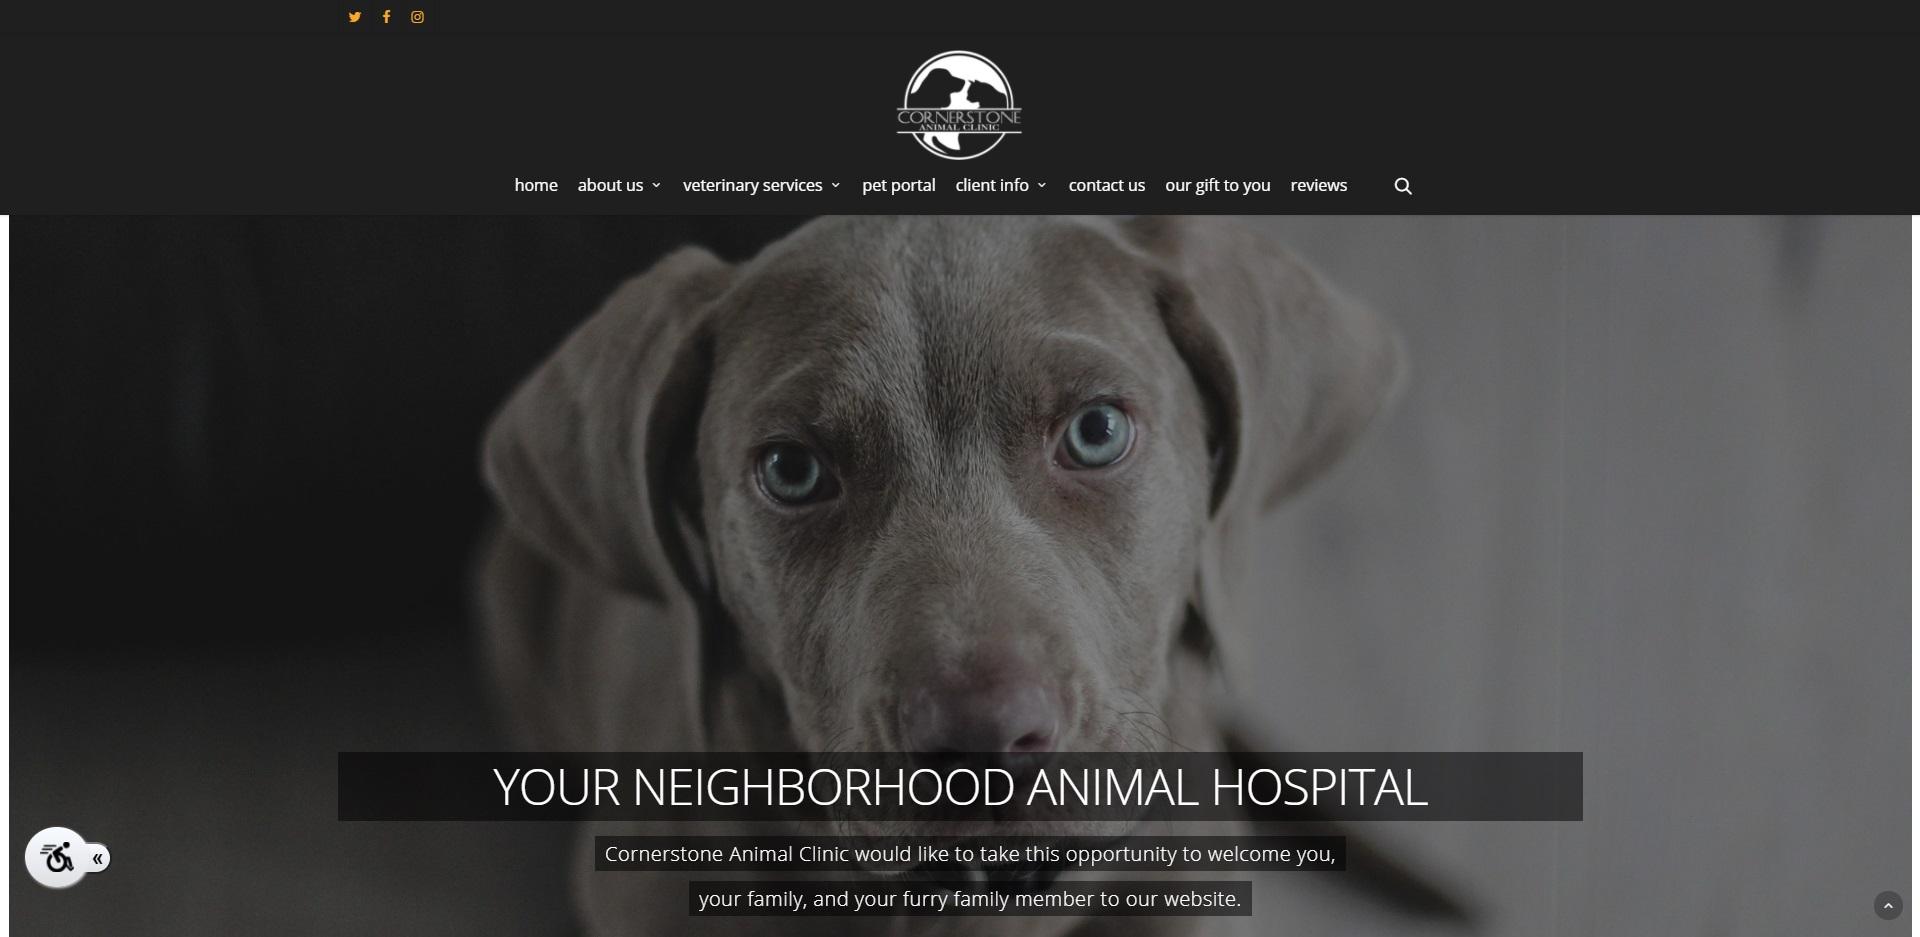 Best Pet Care Centers in Dallas